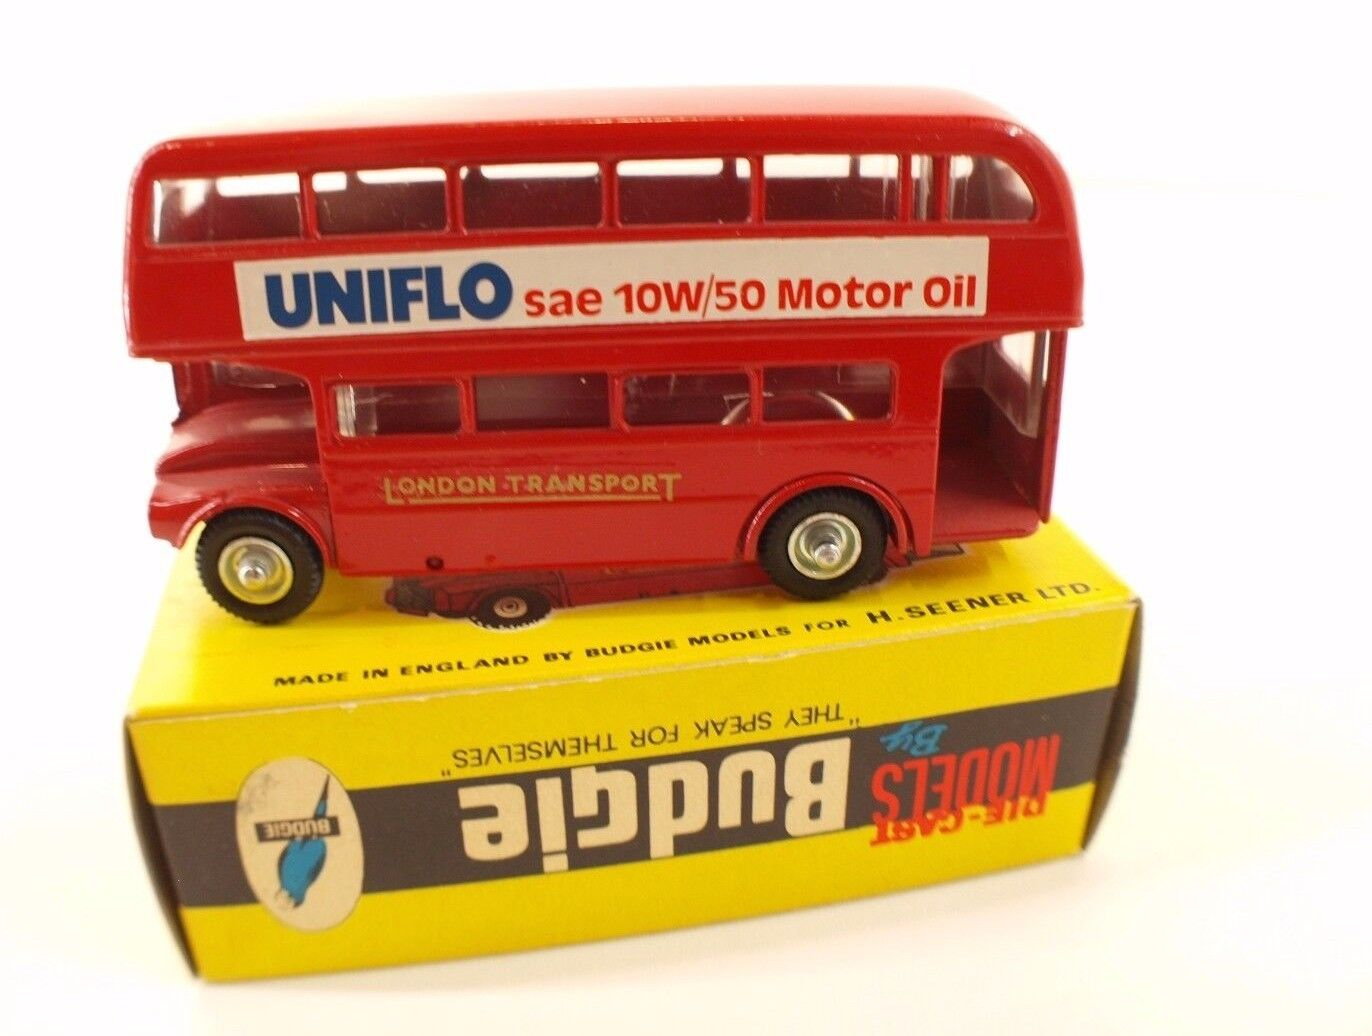 Budgie Models n° 236  AEC Routemaster 64 Seater bus UNIFLO Motor Oil en boite